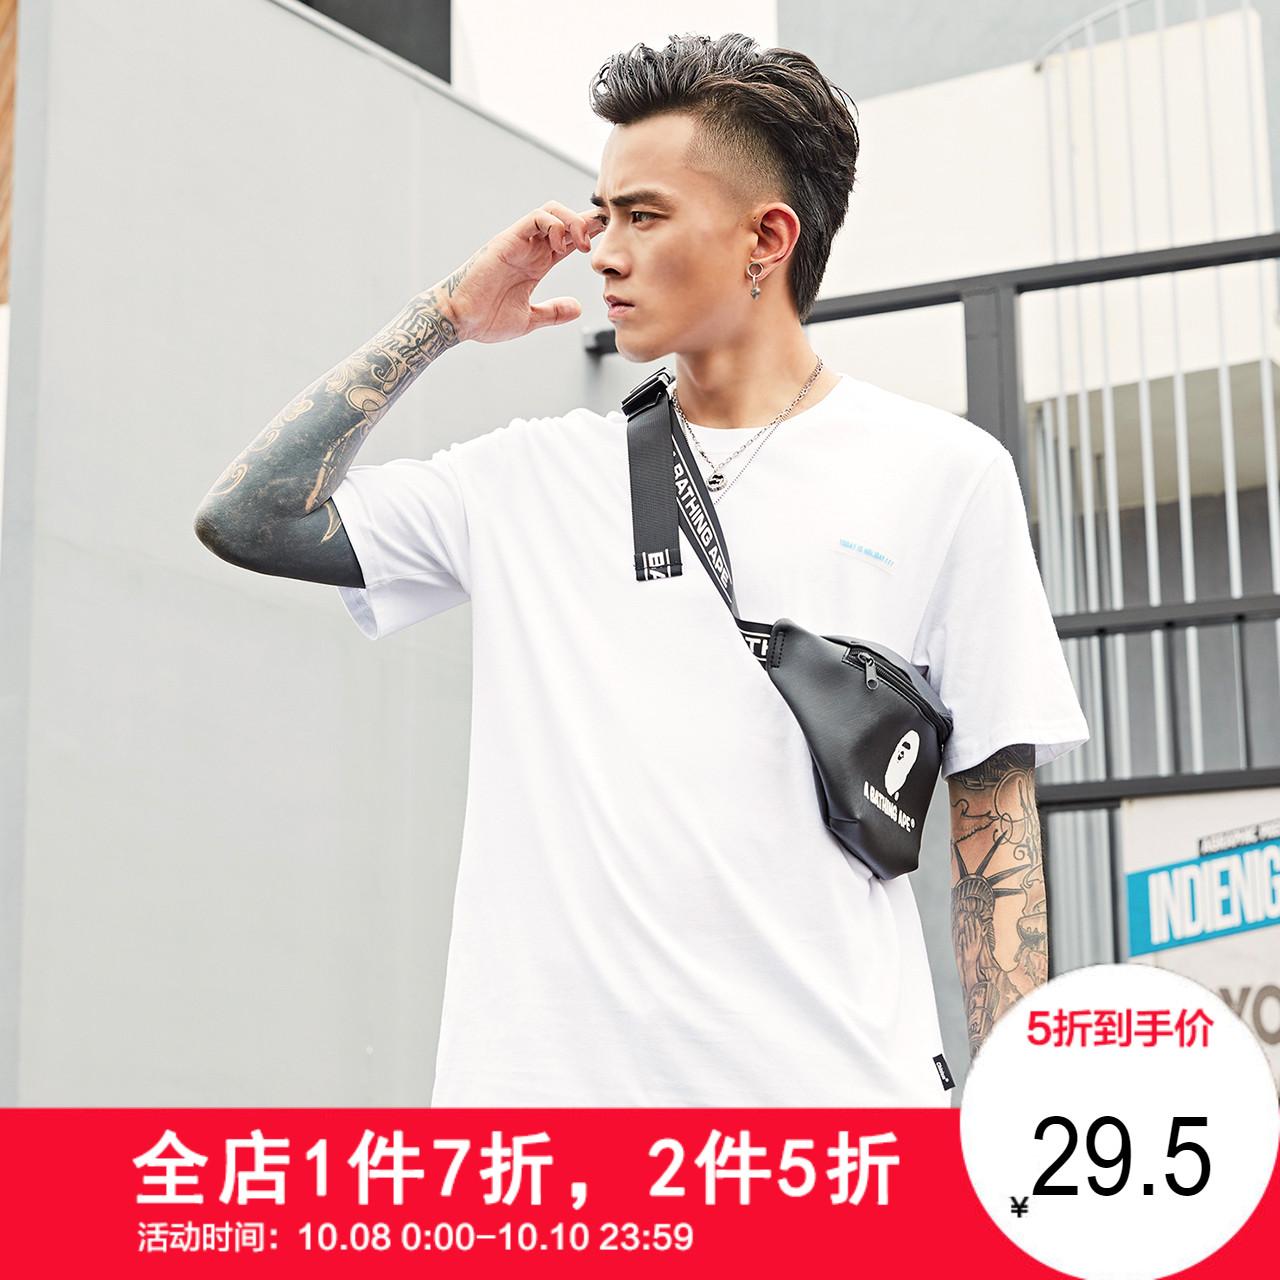 wex男士短袖2019新款夏季男装t恤11-24新券